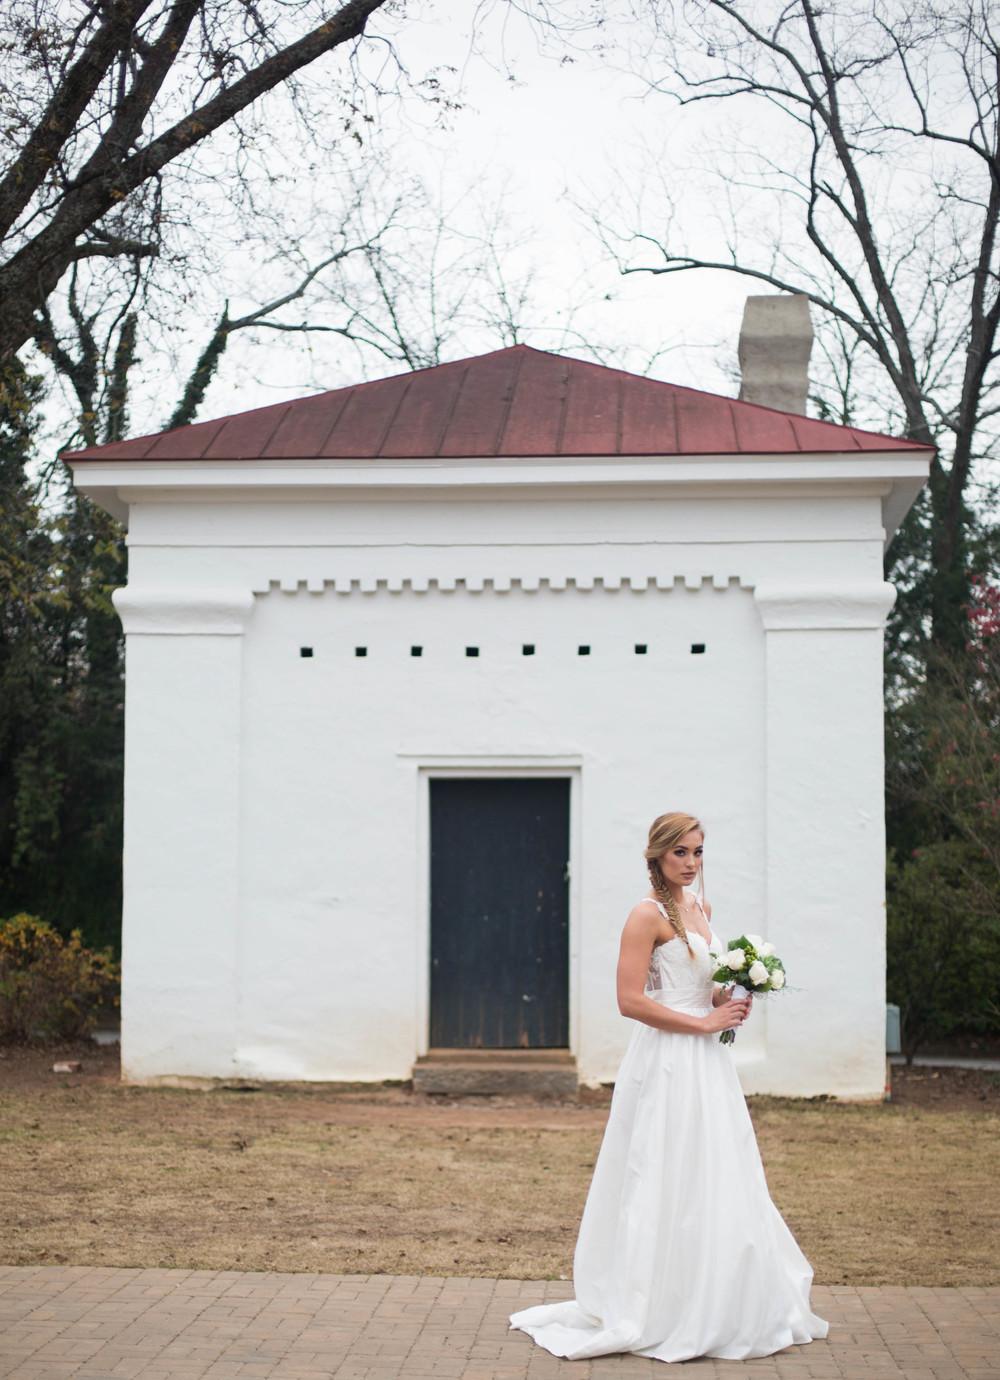 lauren bridal (109 of 123).jpg